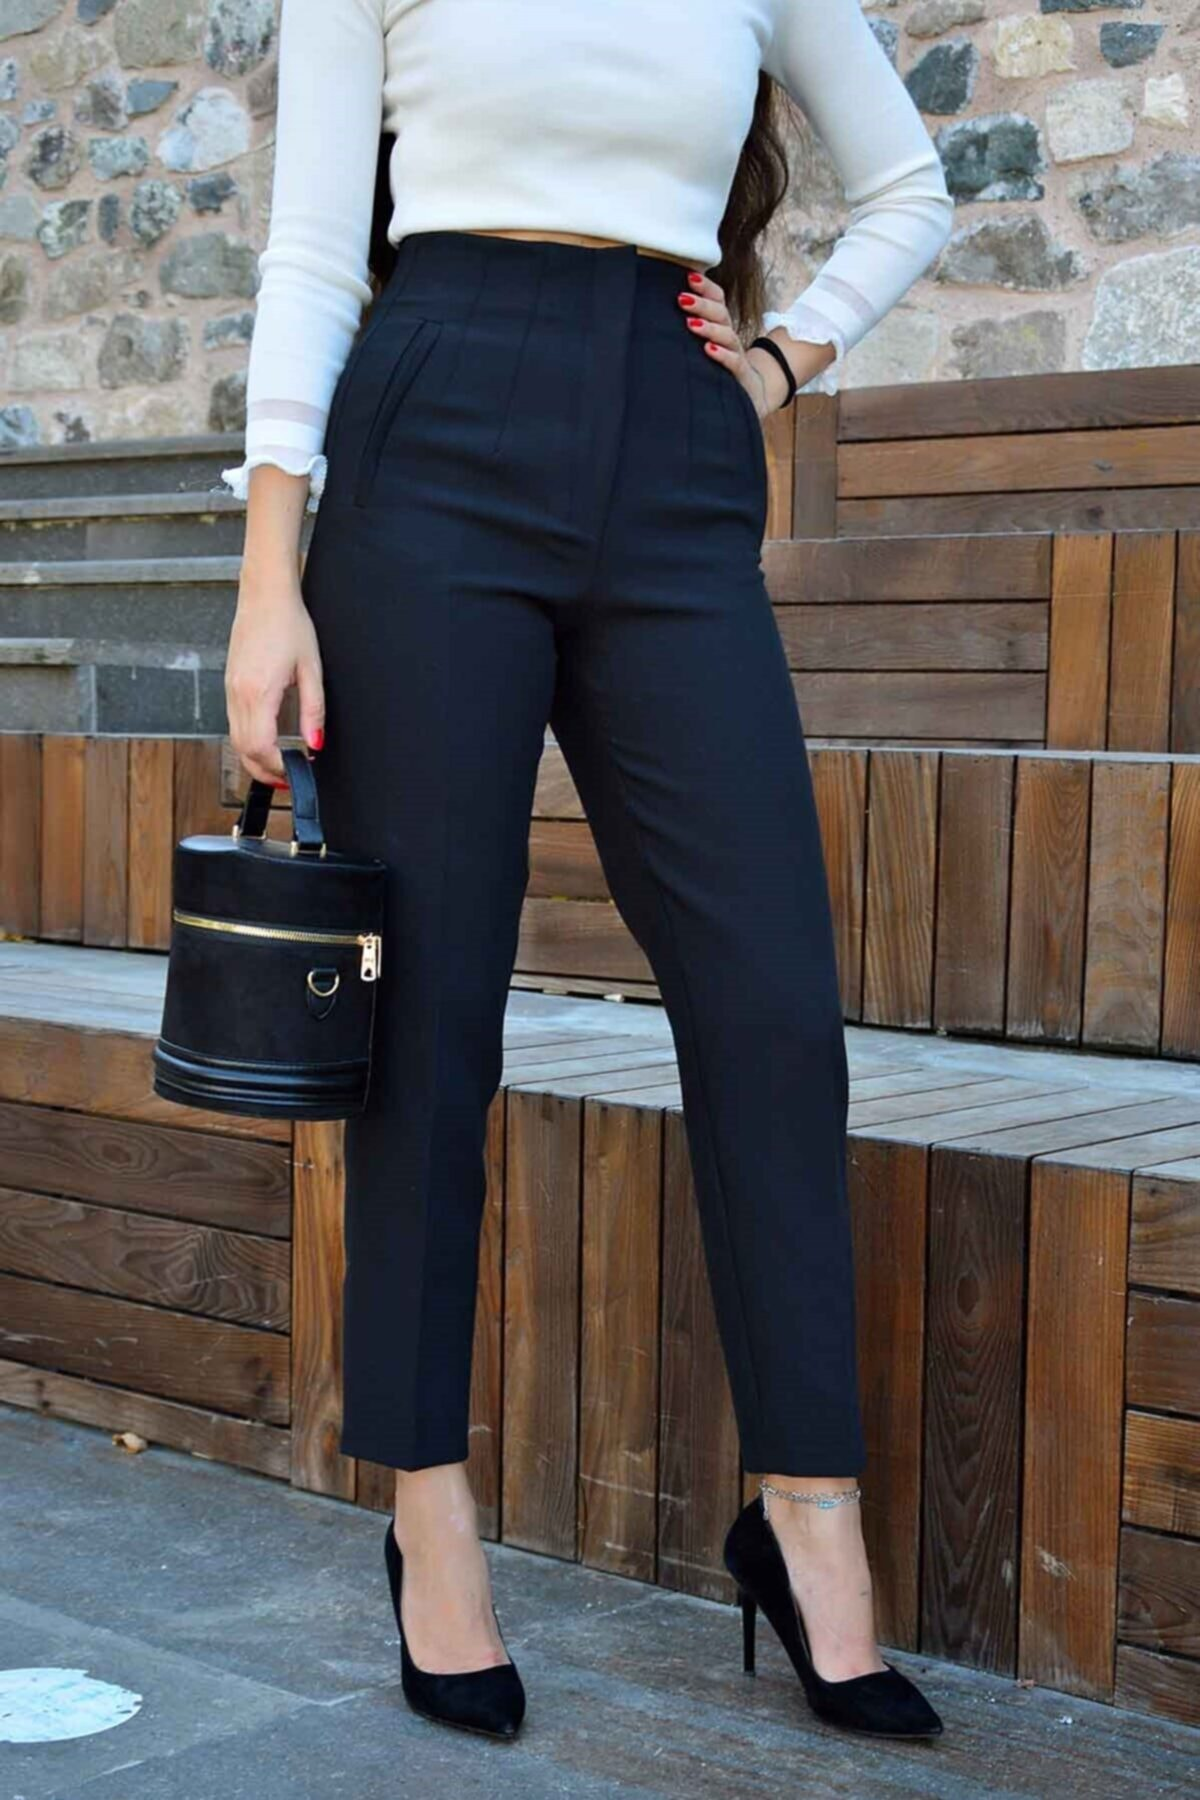 megapol giyim Siyah Önü Flatolu Kumaş Pantolon 1